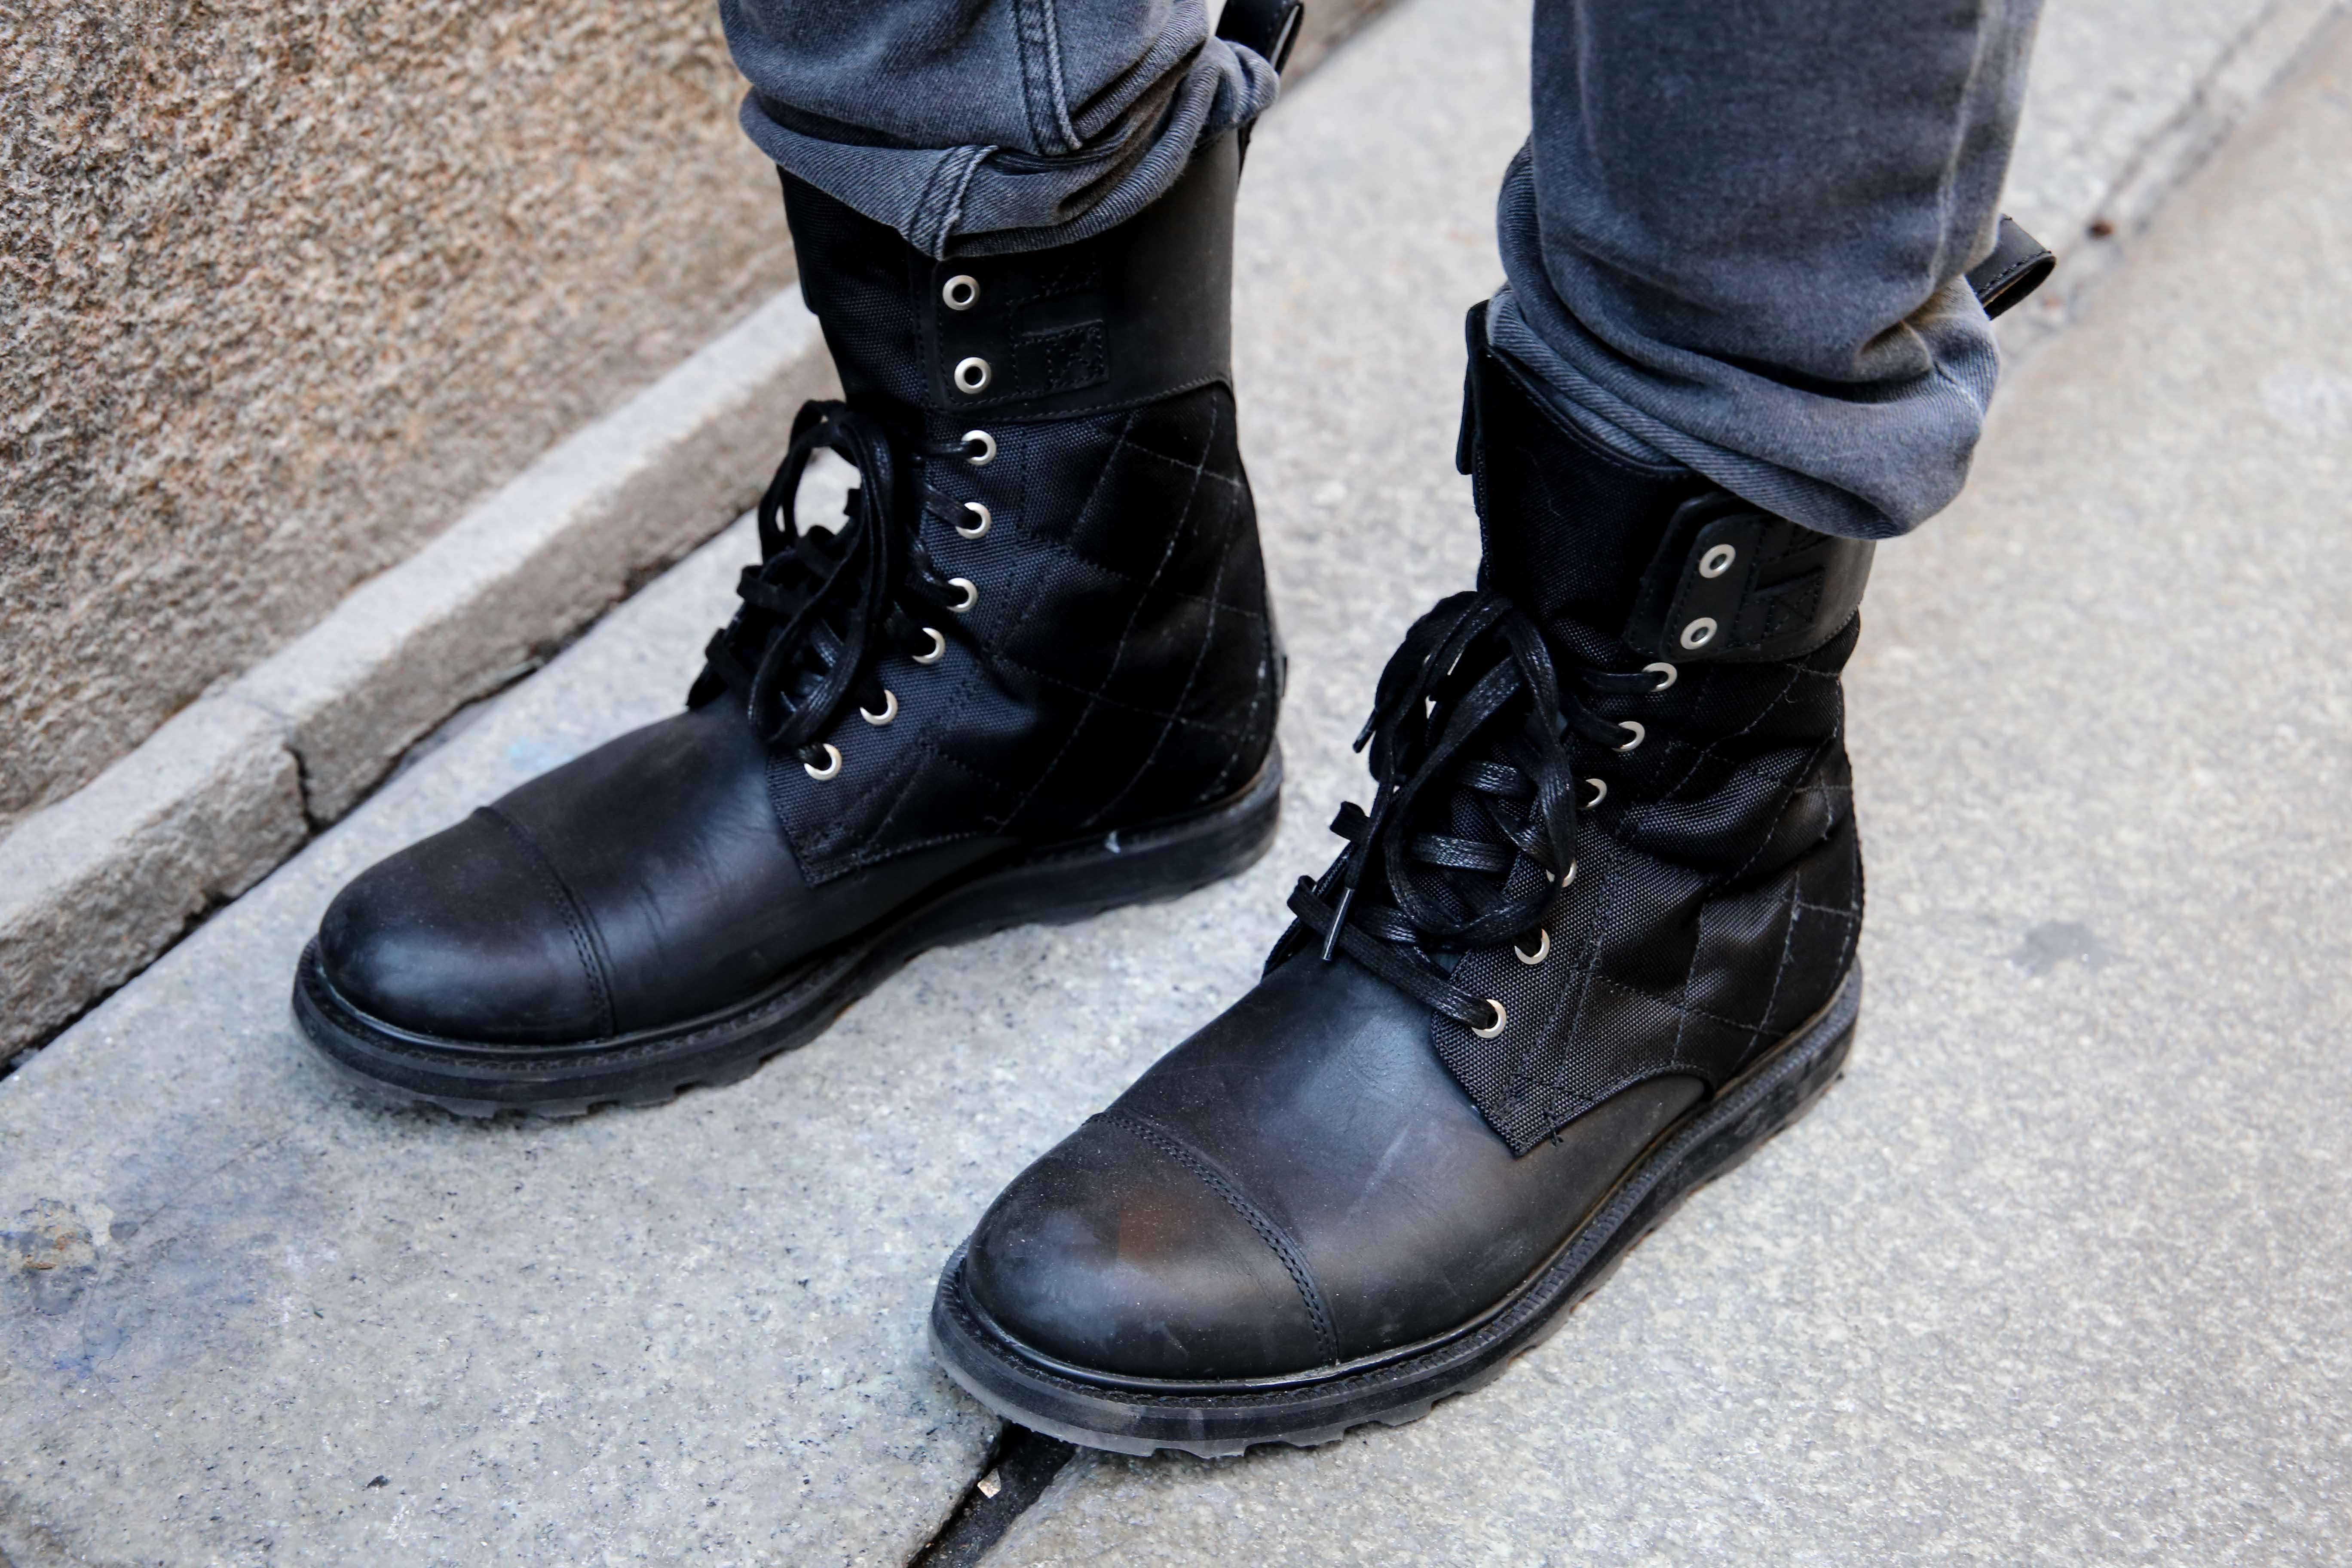 rote-holzfällerjacke-fashion-blog-modeblog-berlin-mailand-germany-deutschland-männerblog-look-sorel-boots